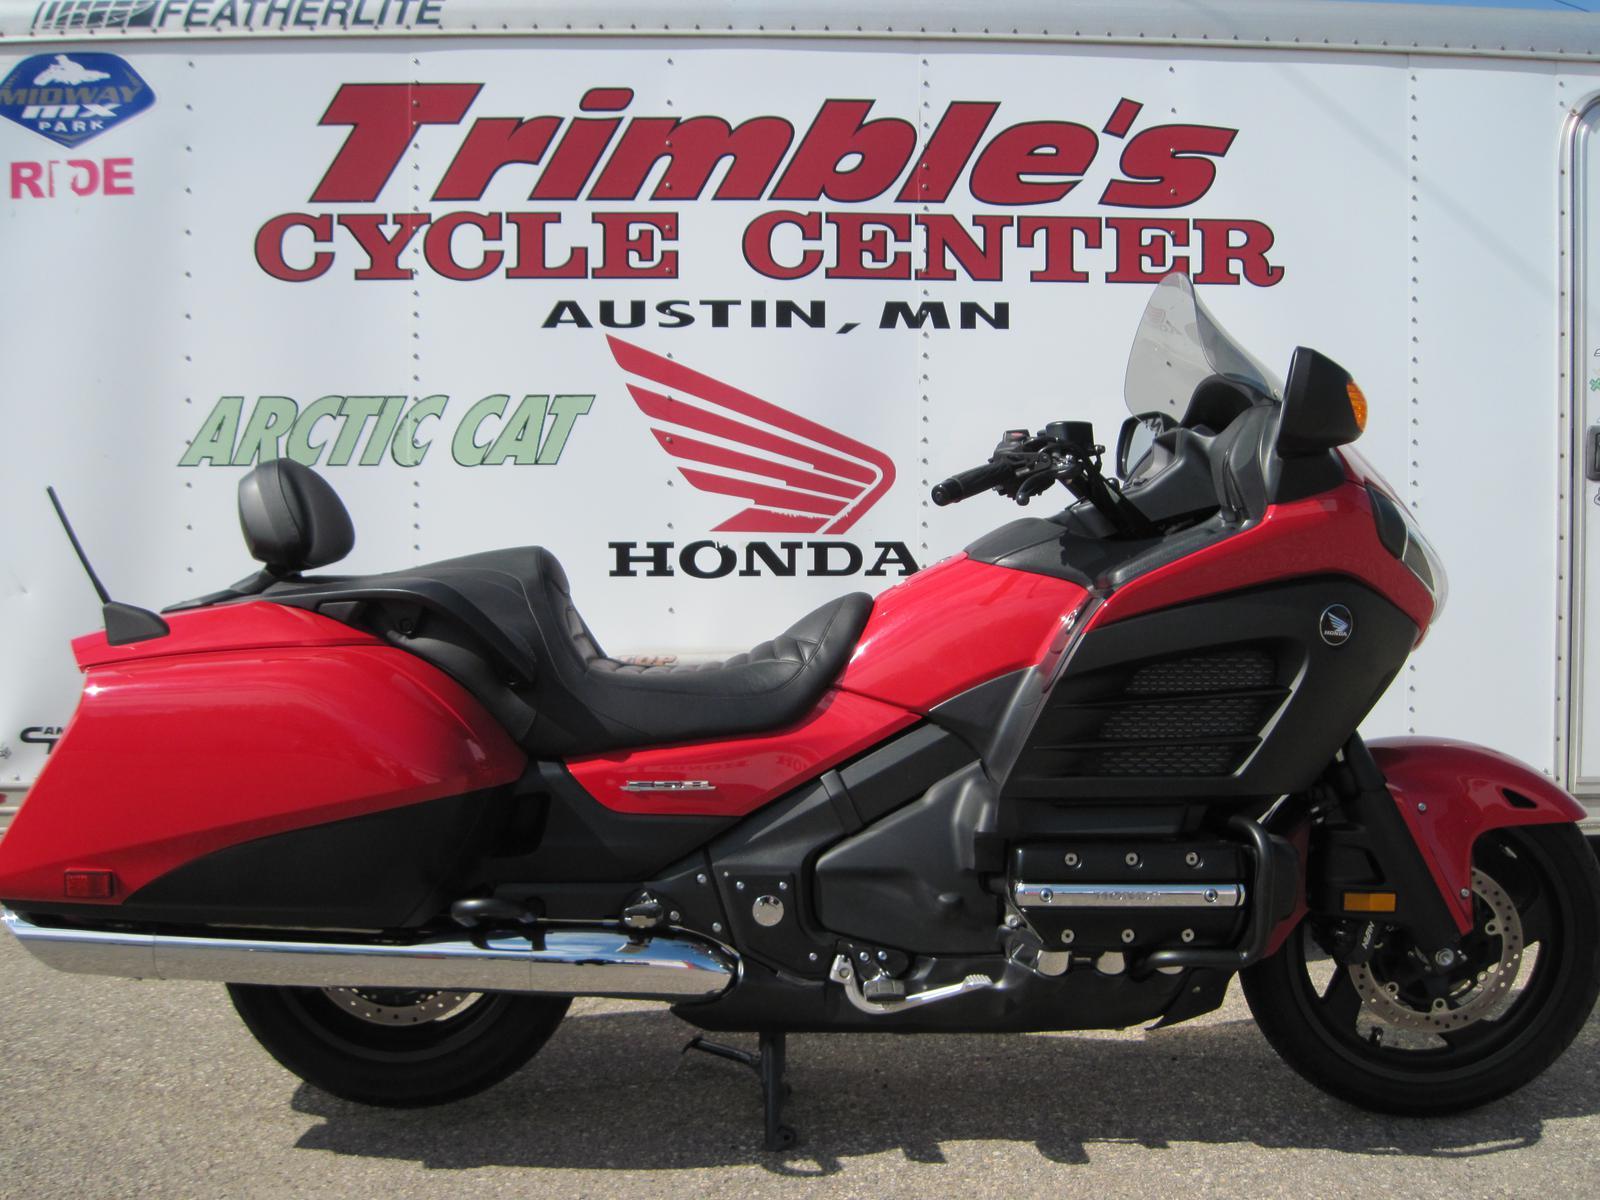 Inventory Trimble S Cycle Center Austin Mn 507 437 6661